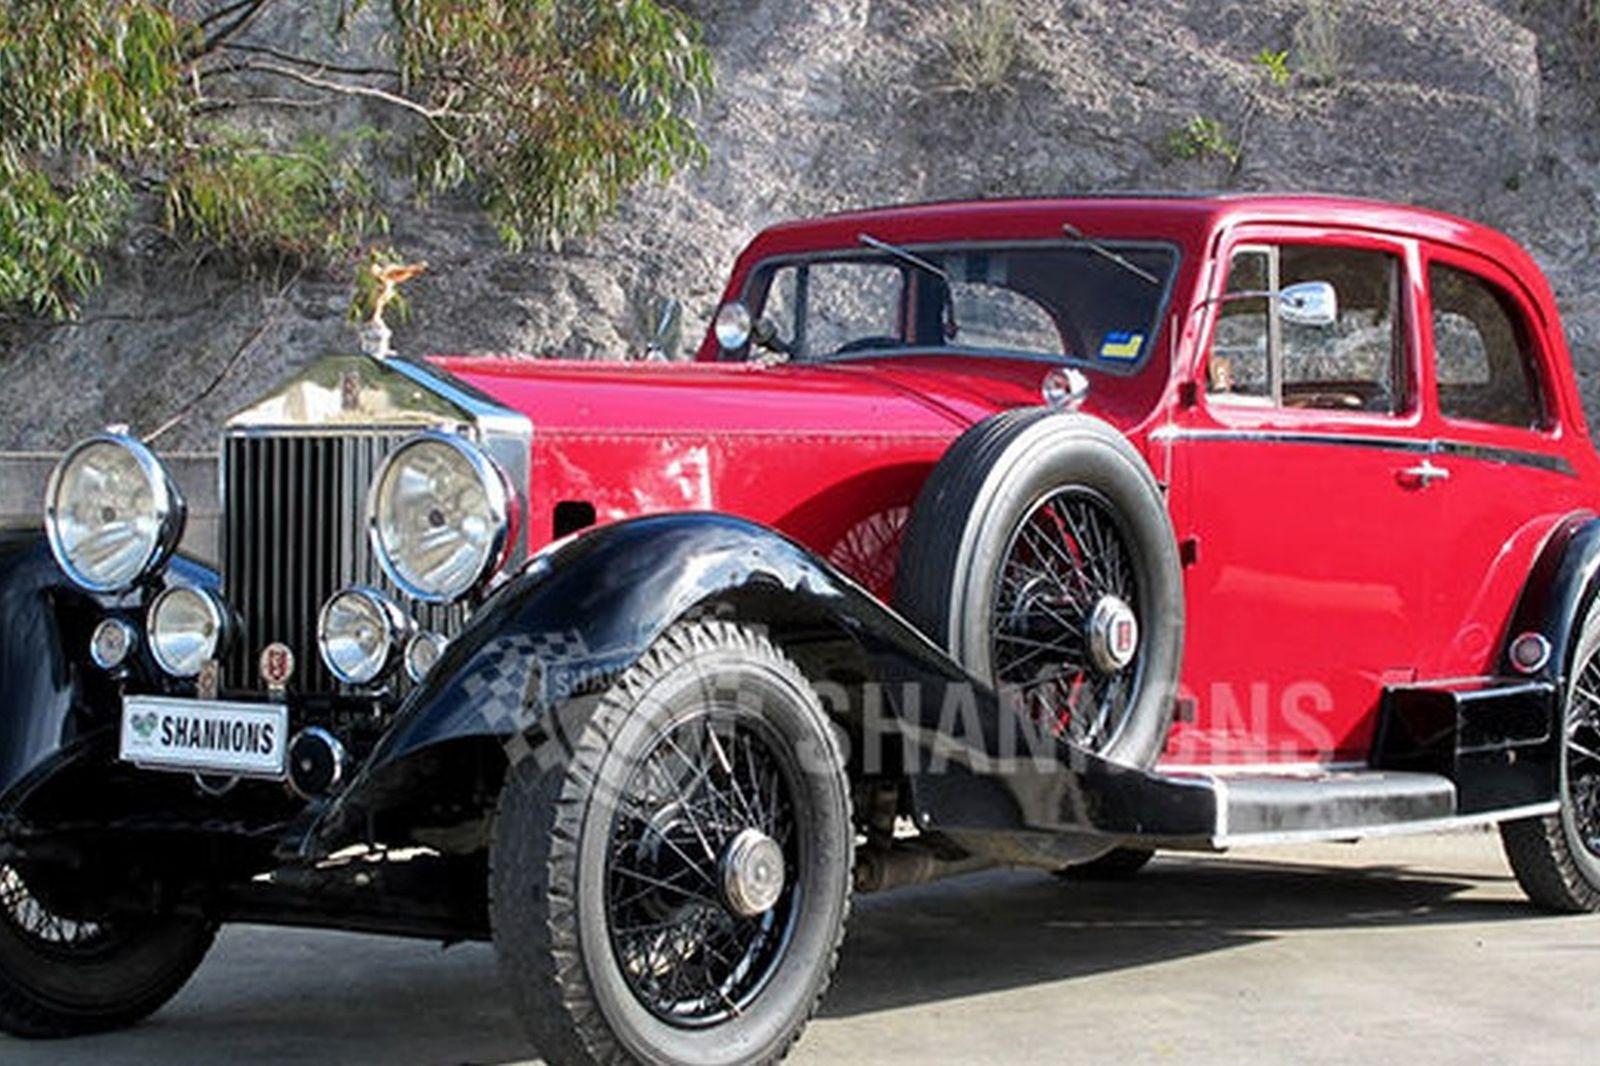 Sold: Rolls-Royce Phantom 1 2Dr Saloon Auctions - Lot 16 ...